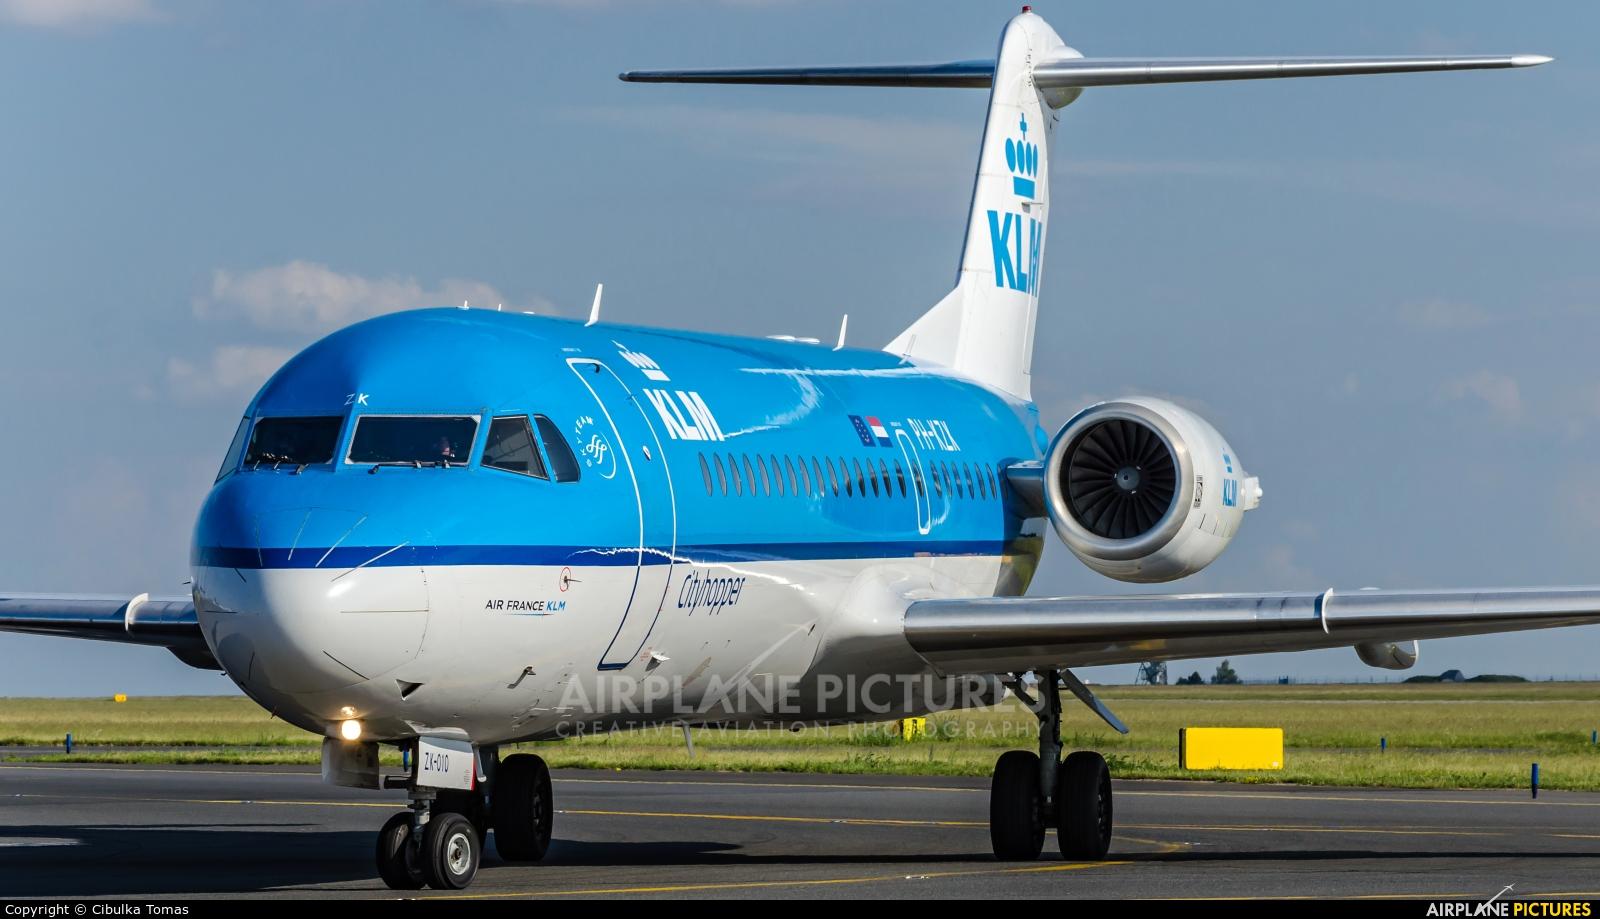 KLM Cityhopper PH-KZK aircraft at Prague - Václav Havel